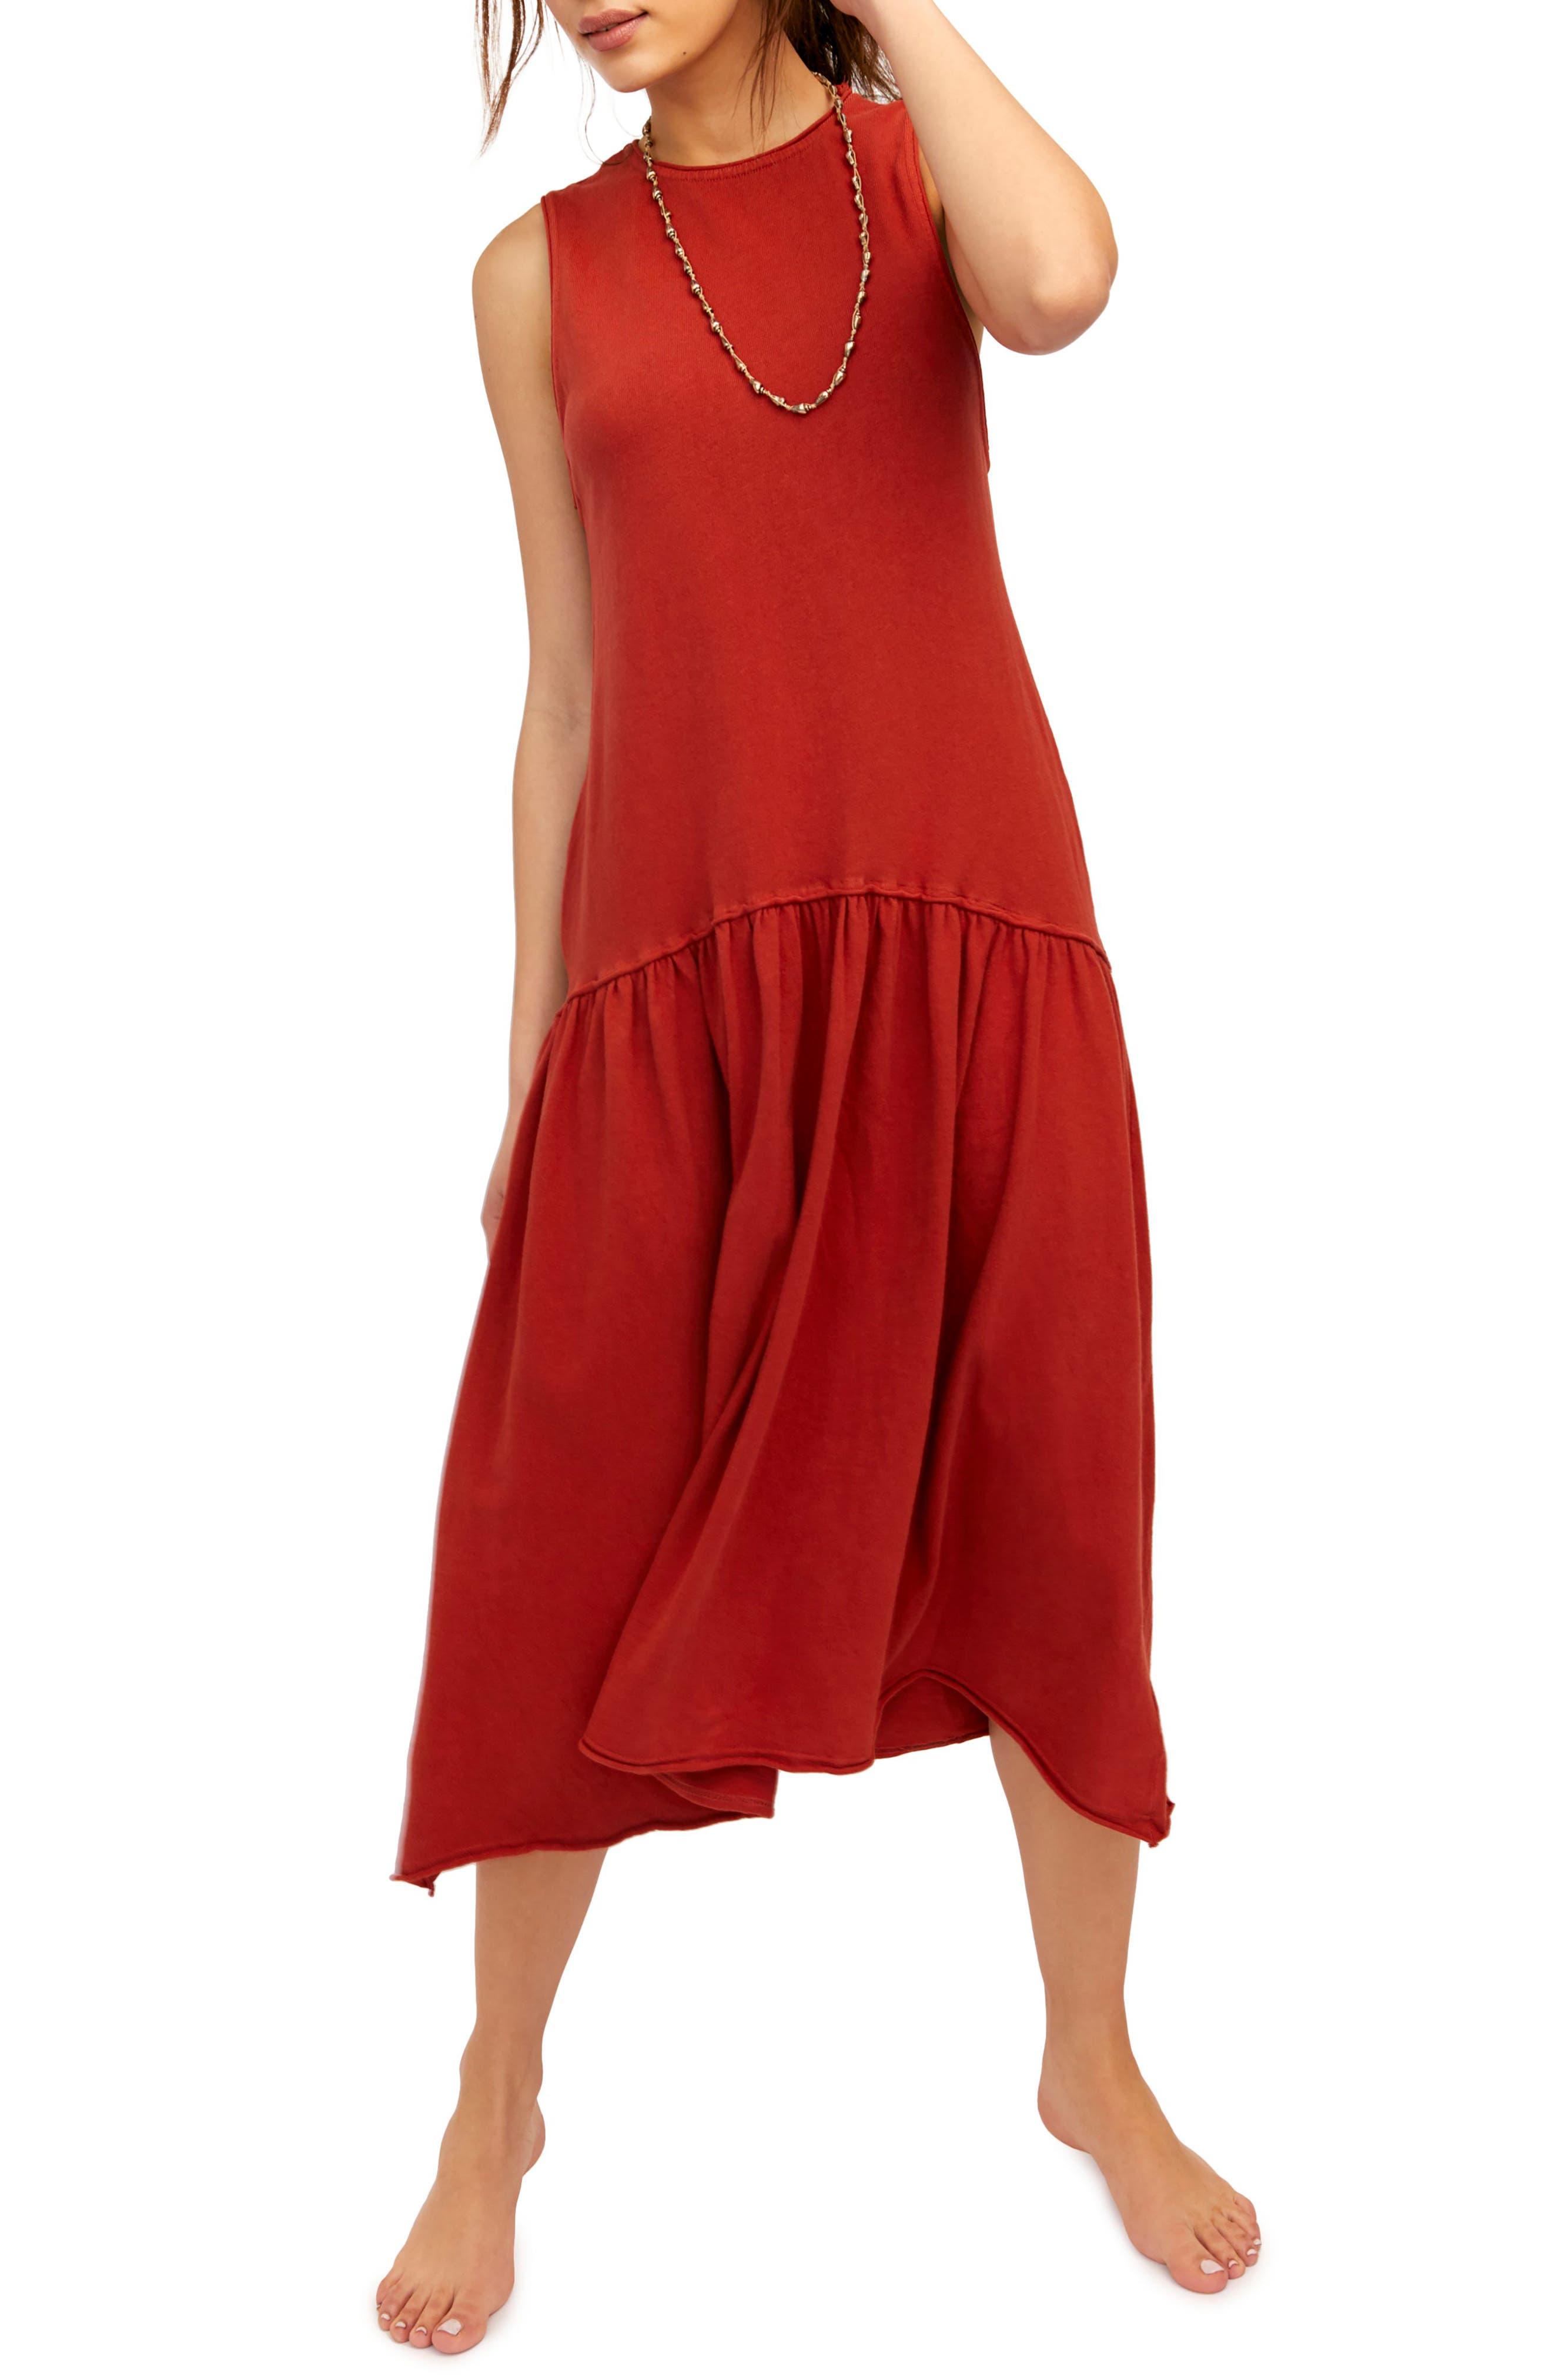 Endless Summer By Free People Drop Waist Midi Dress, Orange